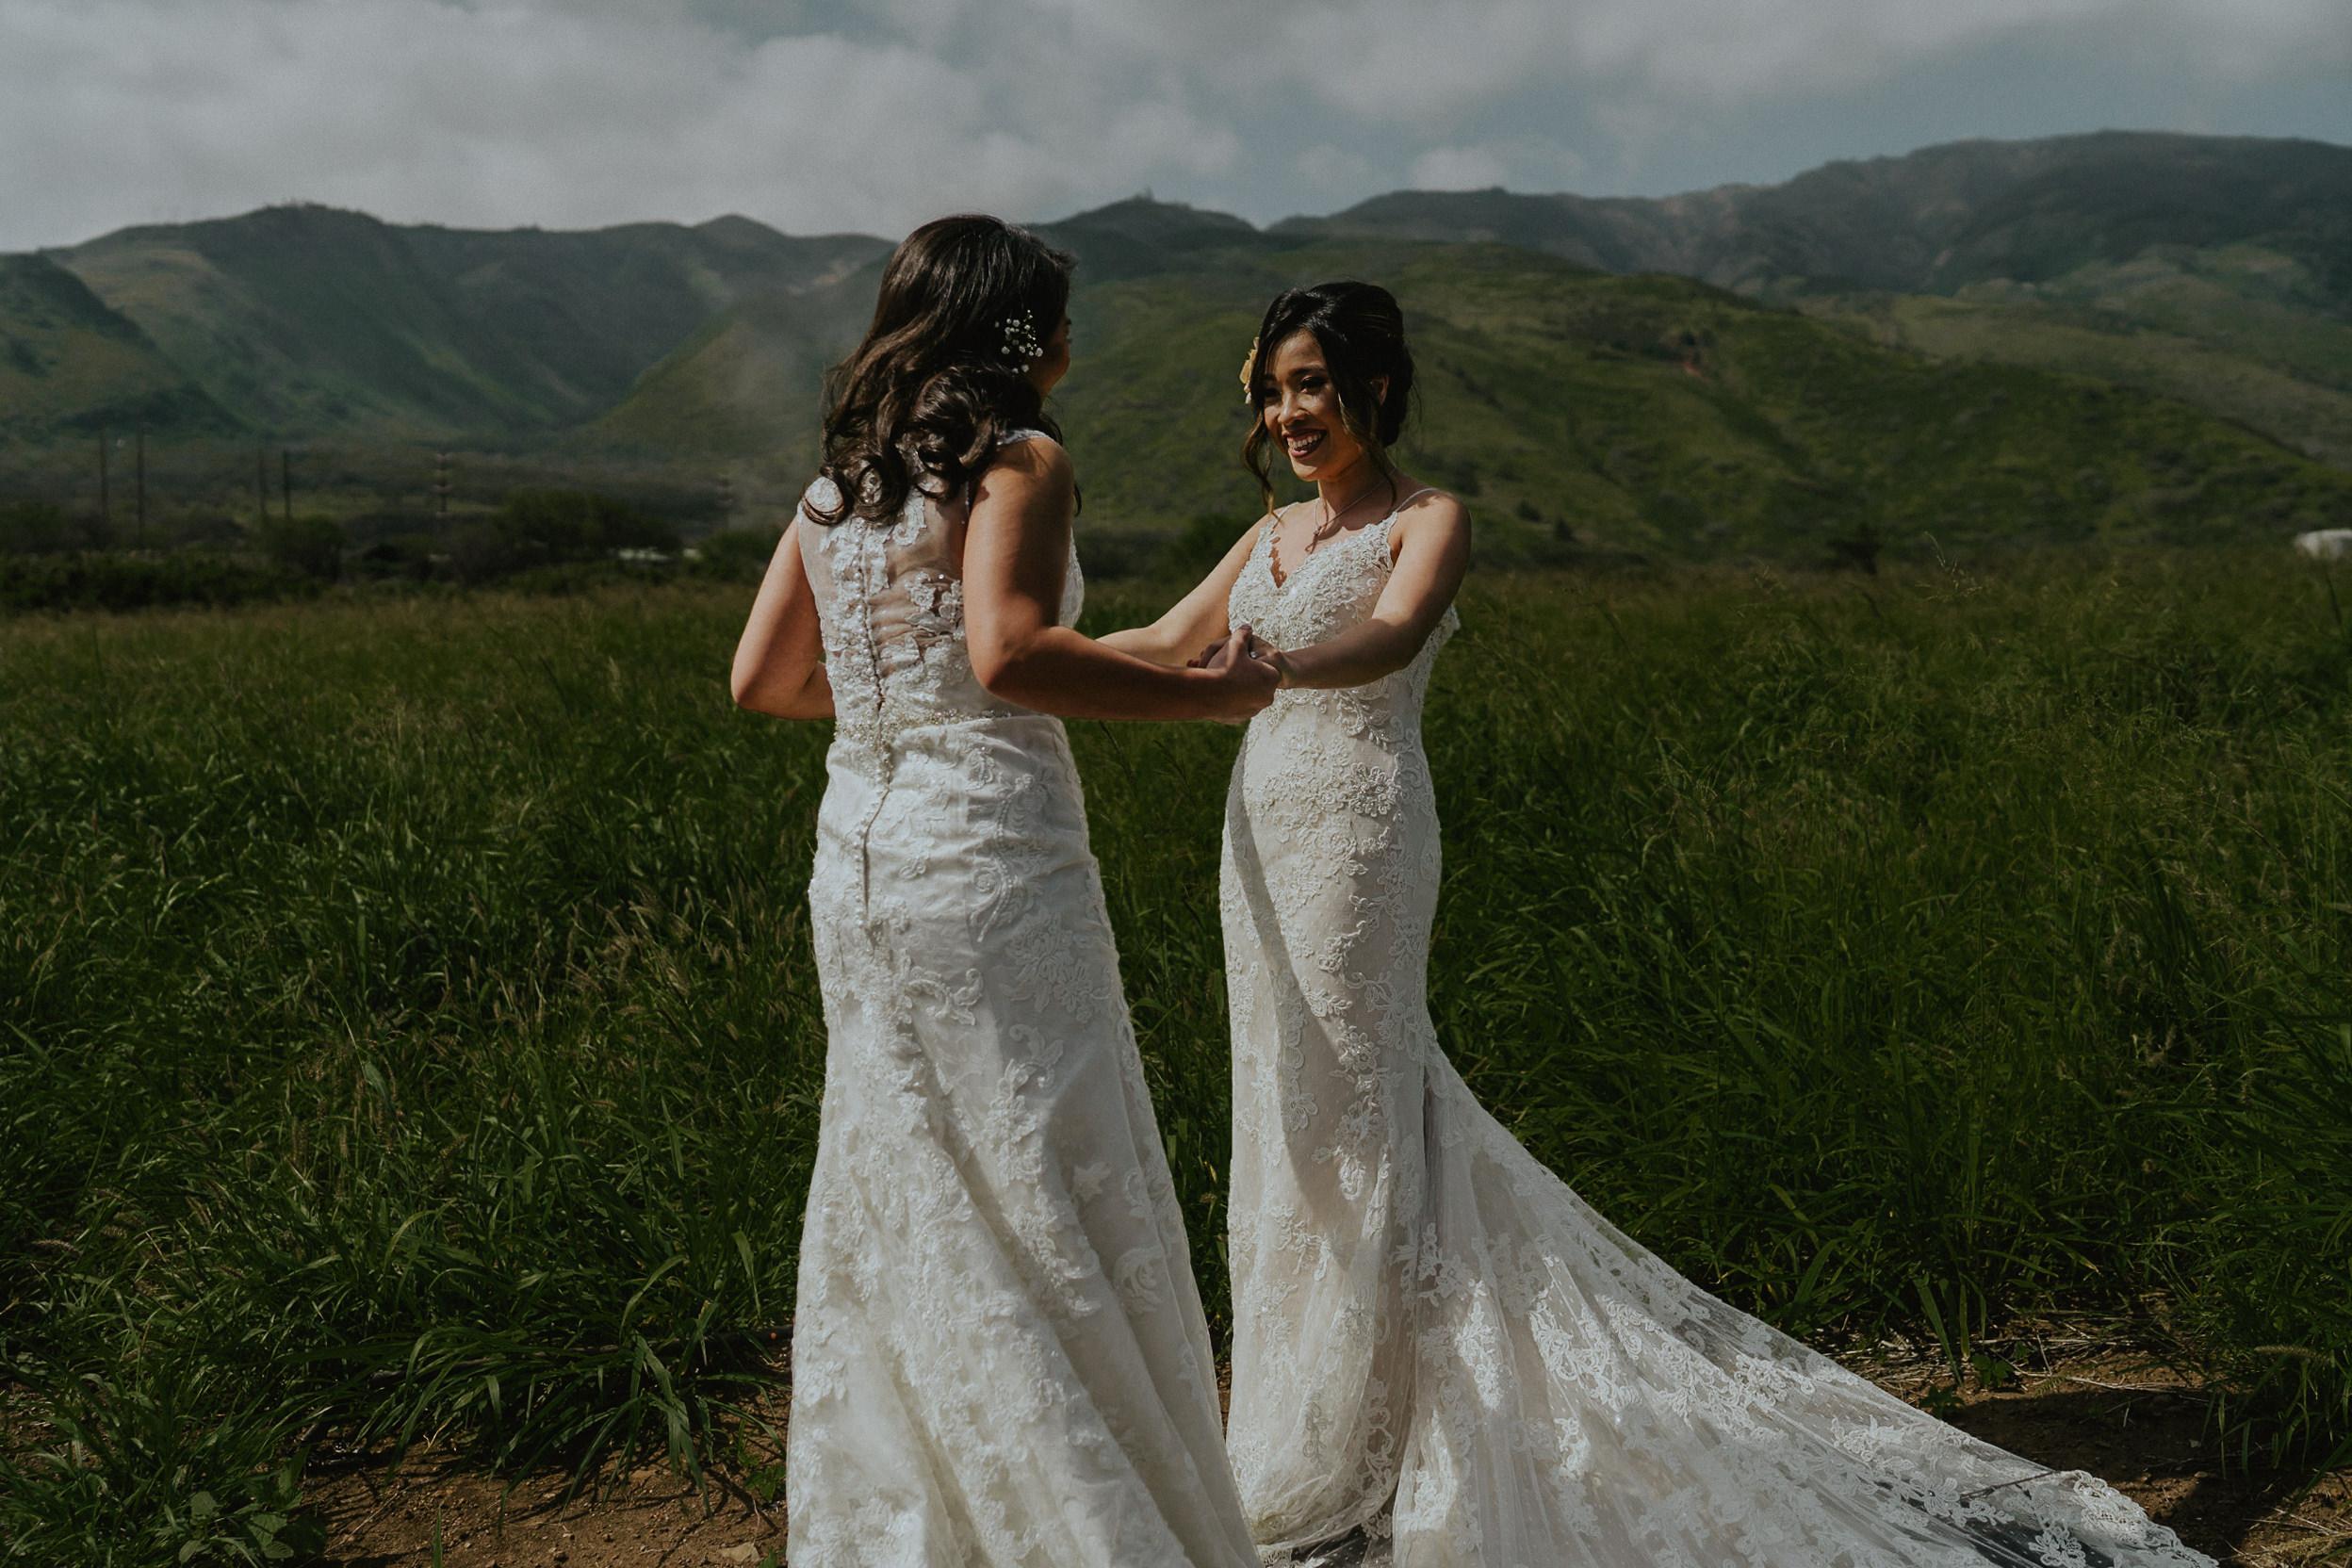 Maui_Destination_wedding_Alfred_Tang-07332.jpg